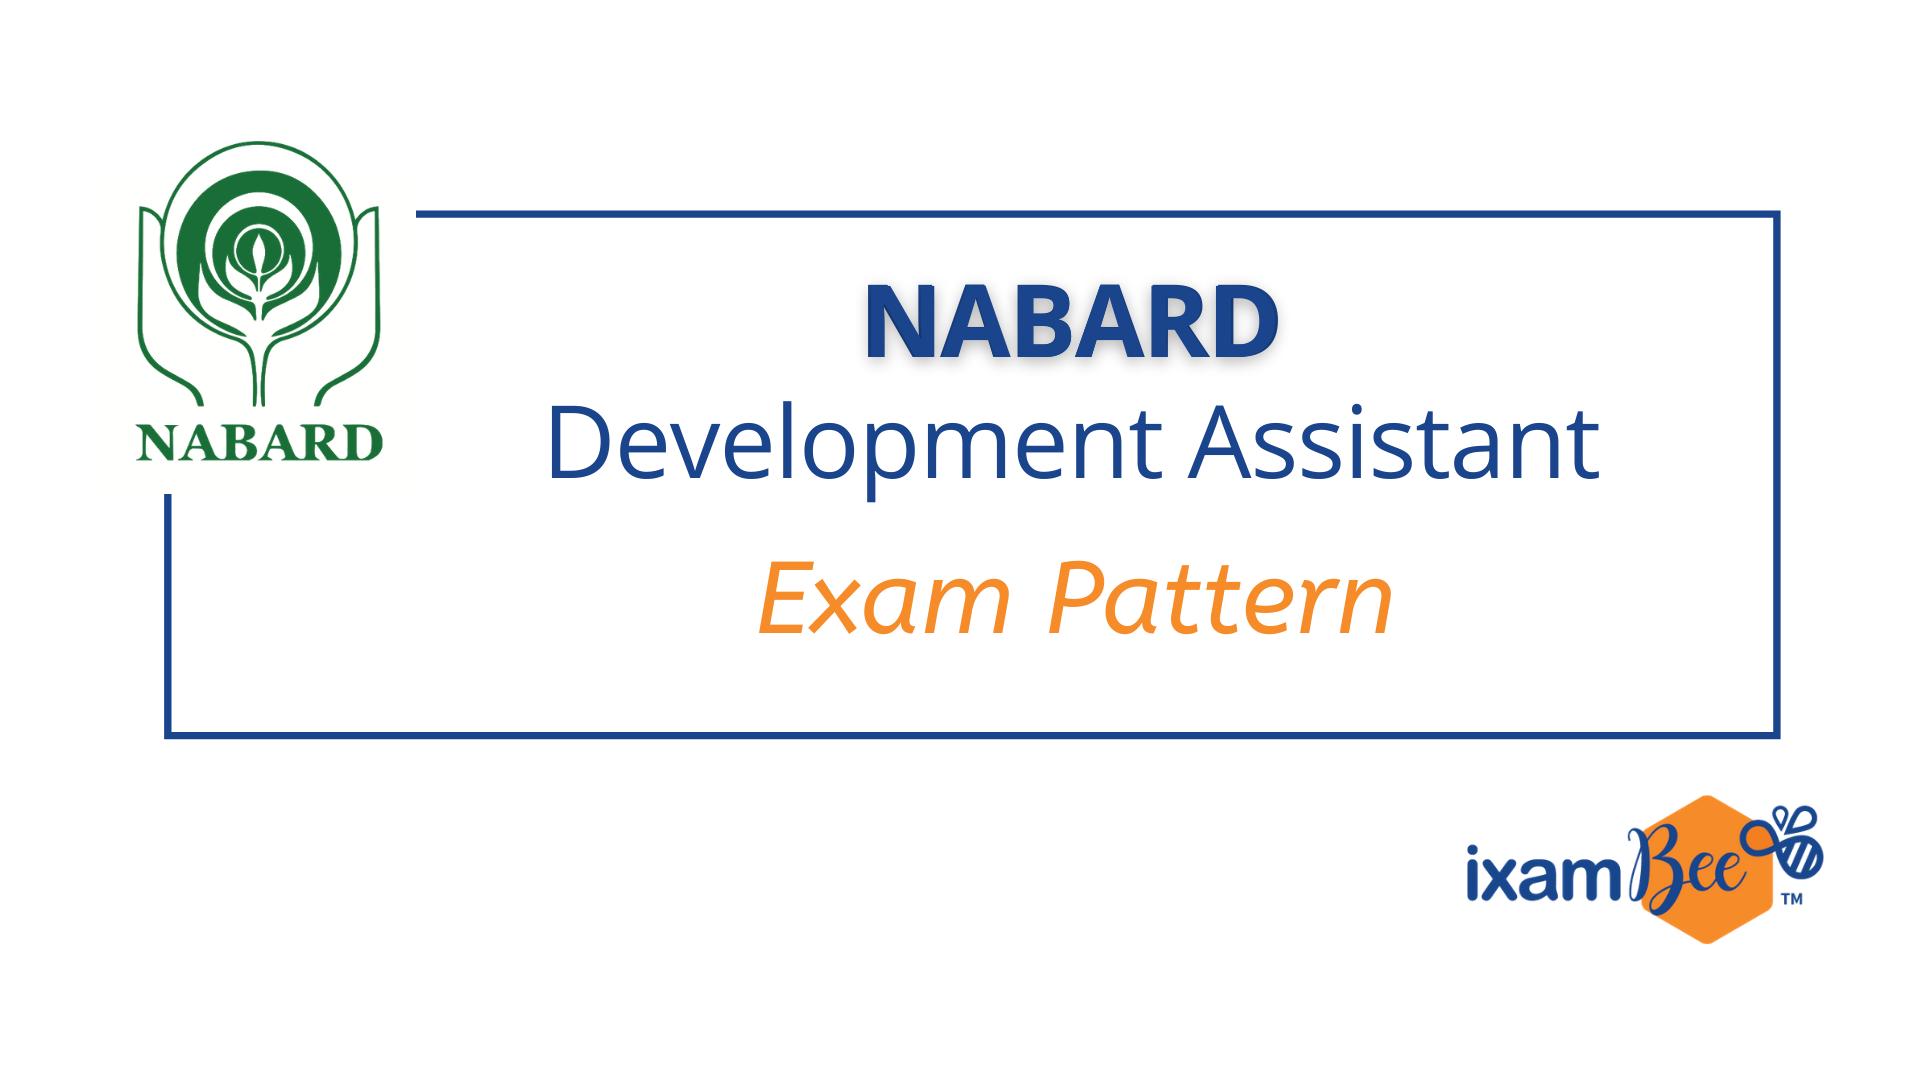 NABARD Development Assistant Exam Pattern